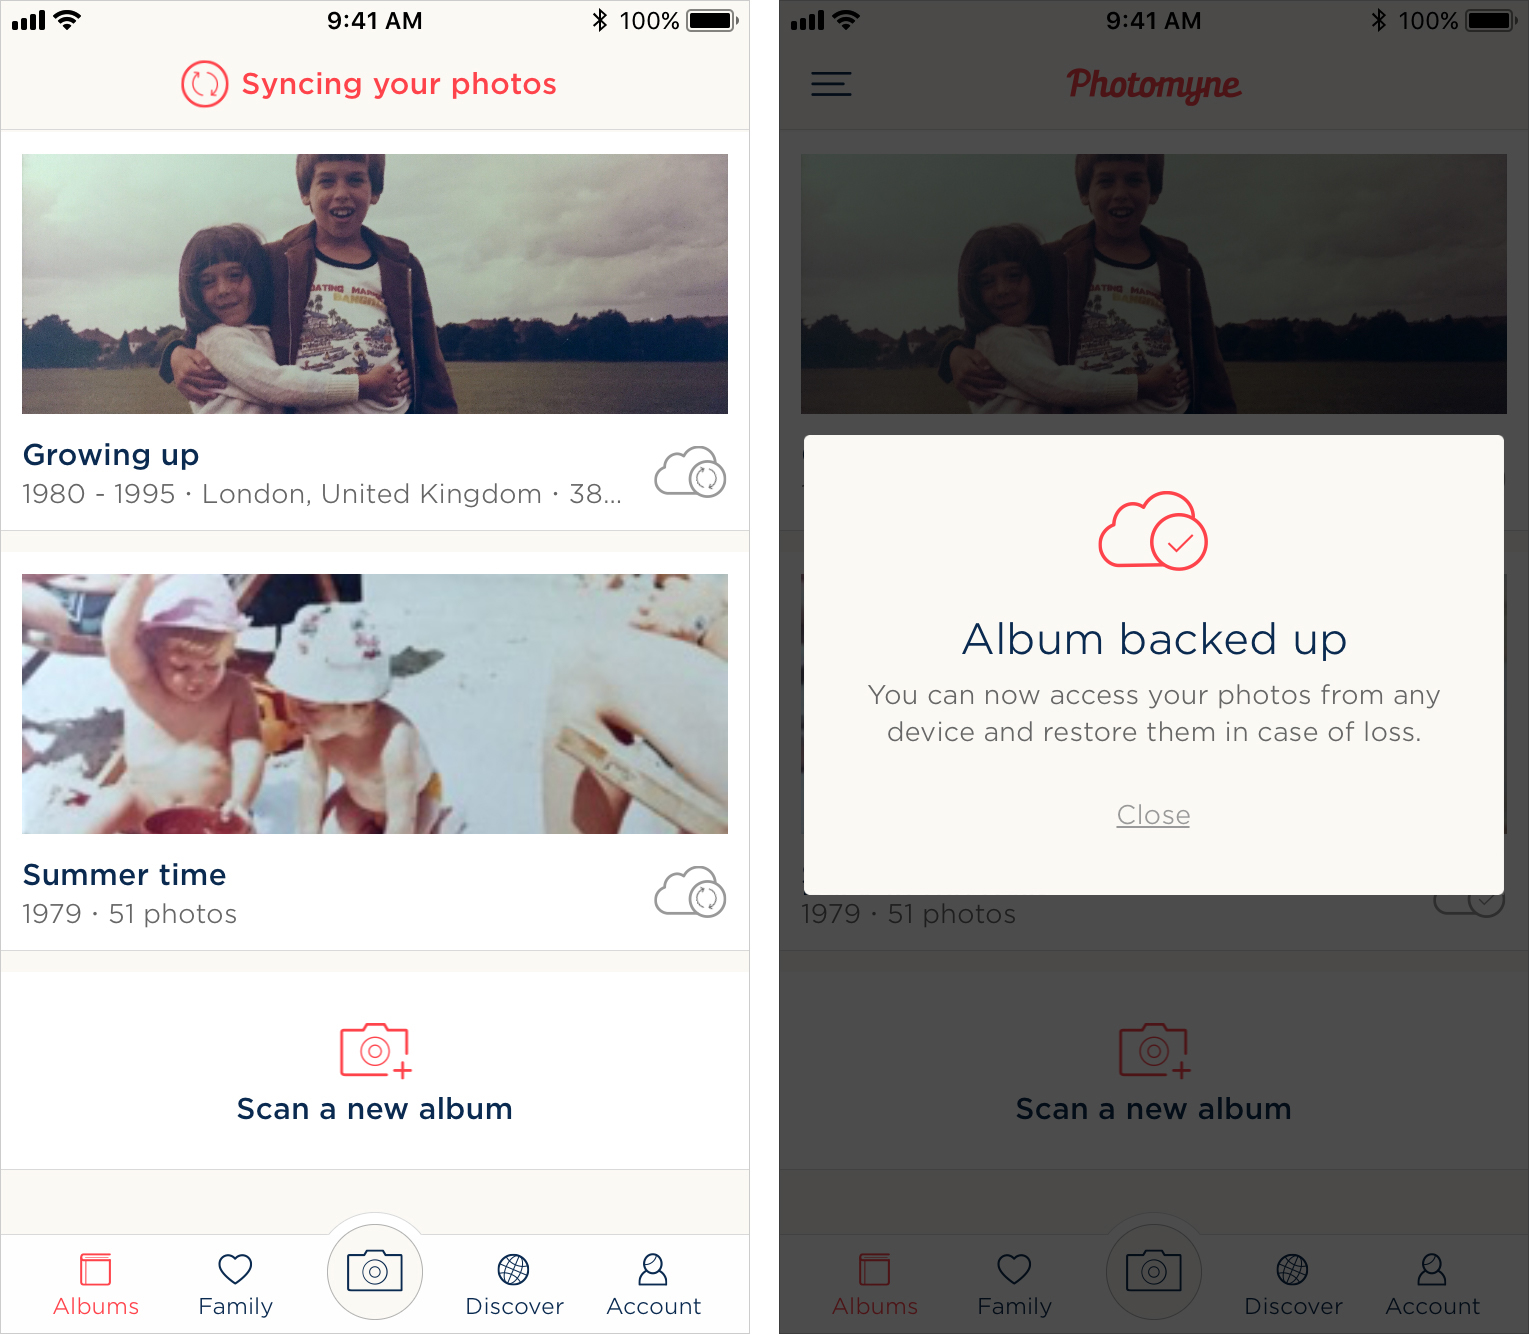 The Photomyne app while backing up photos